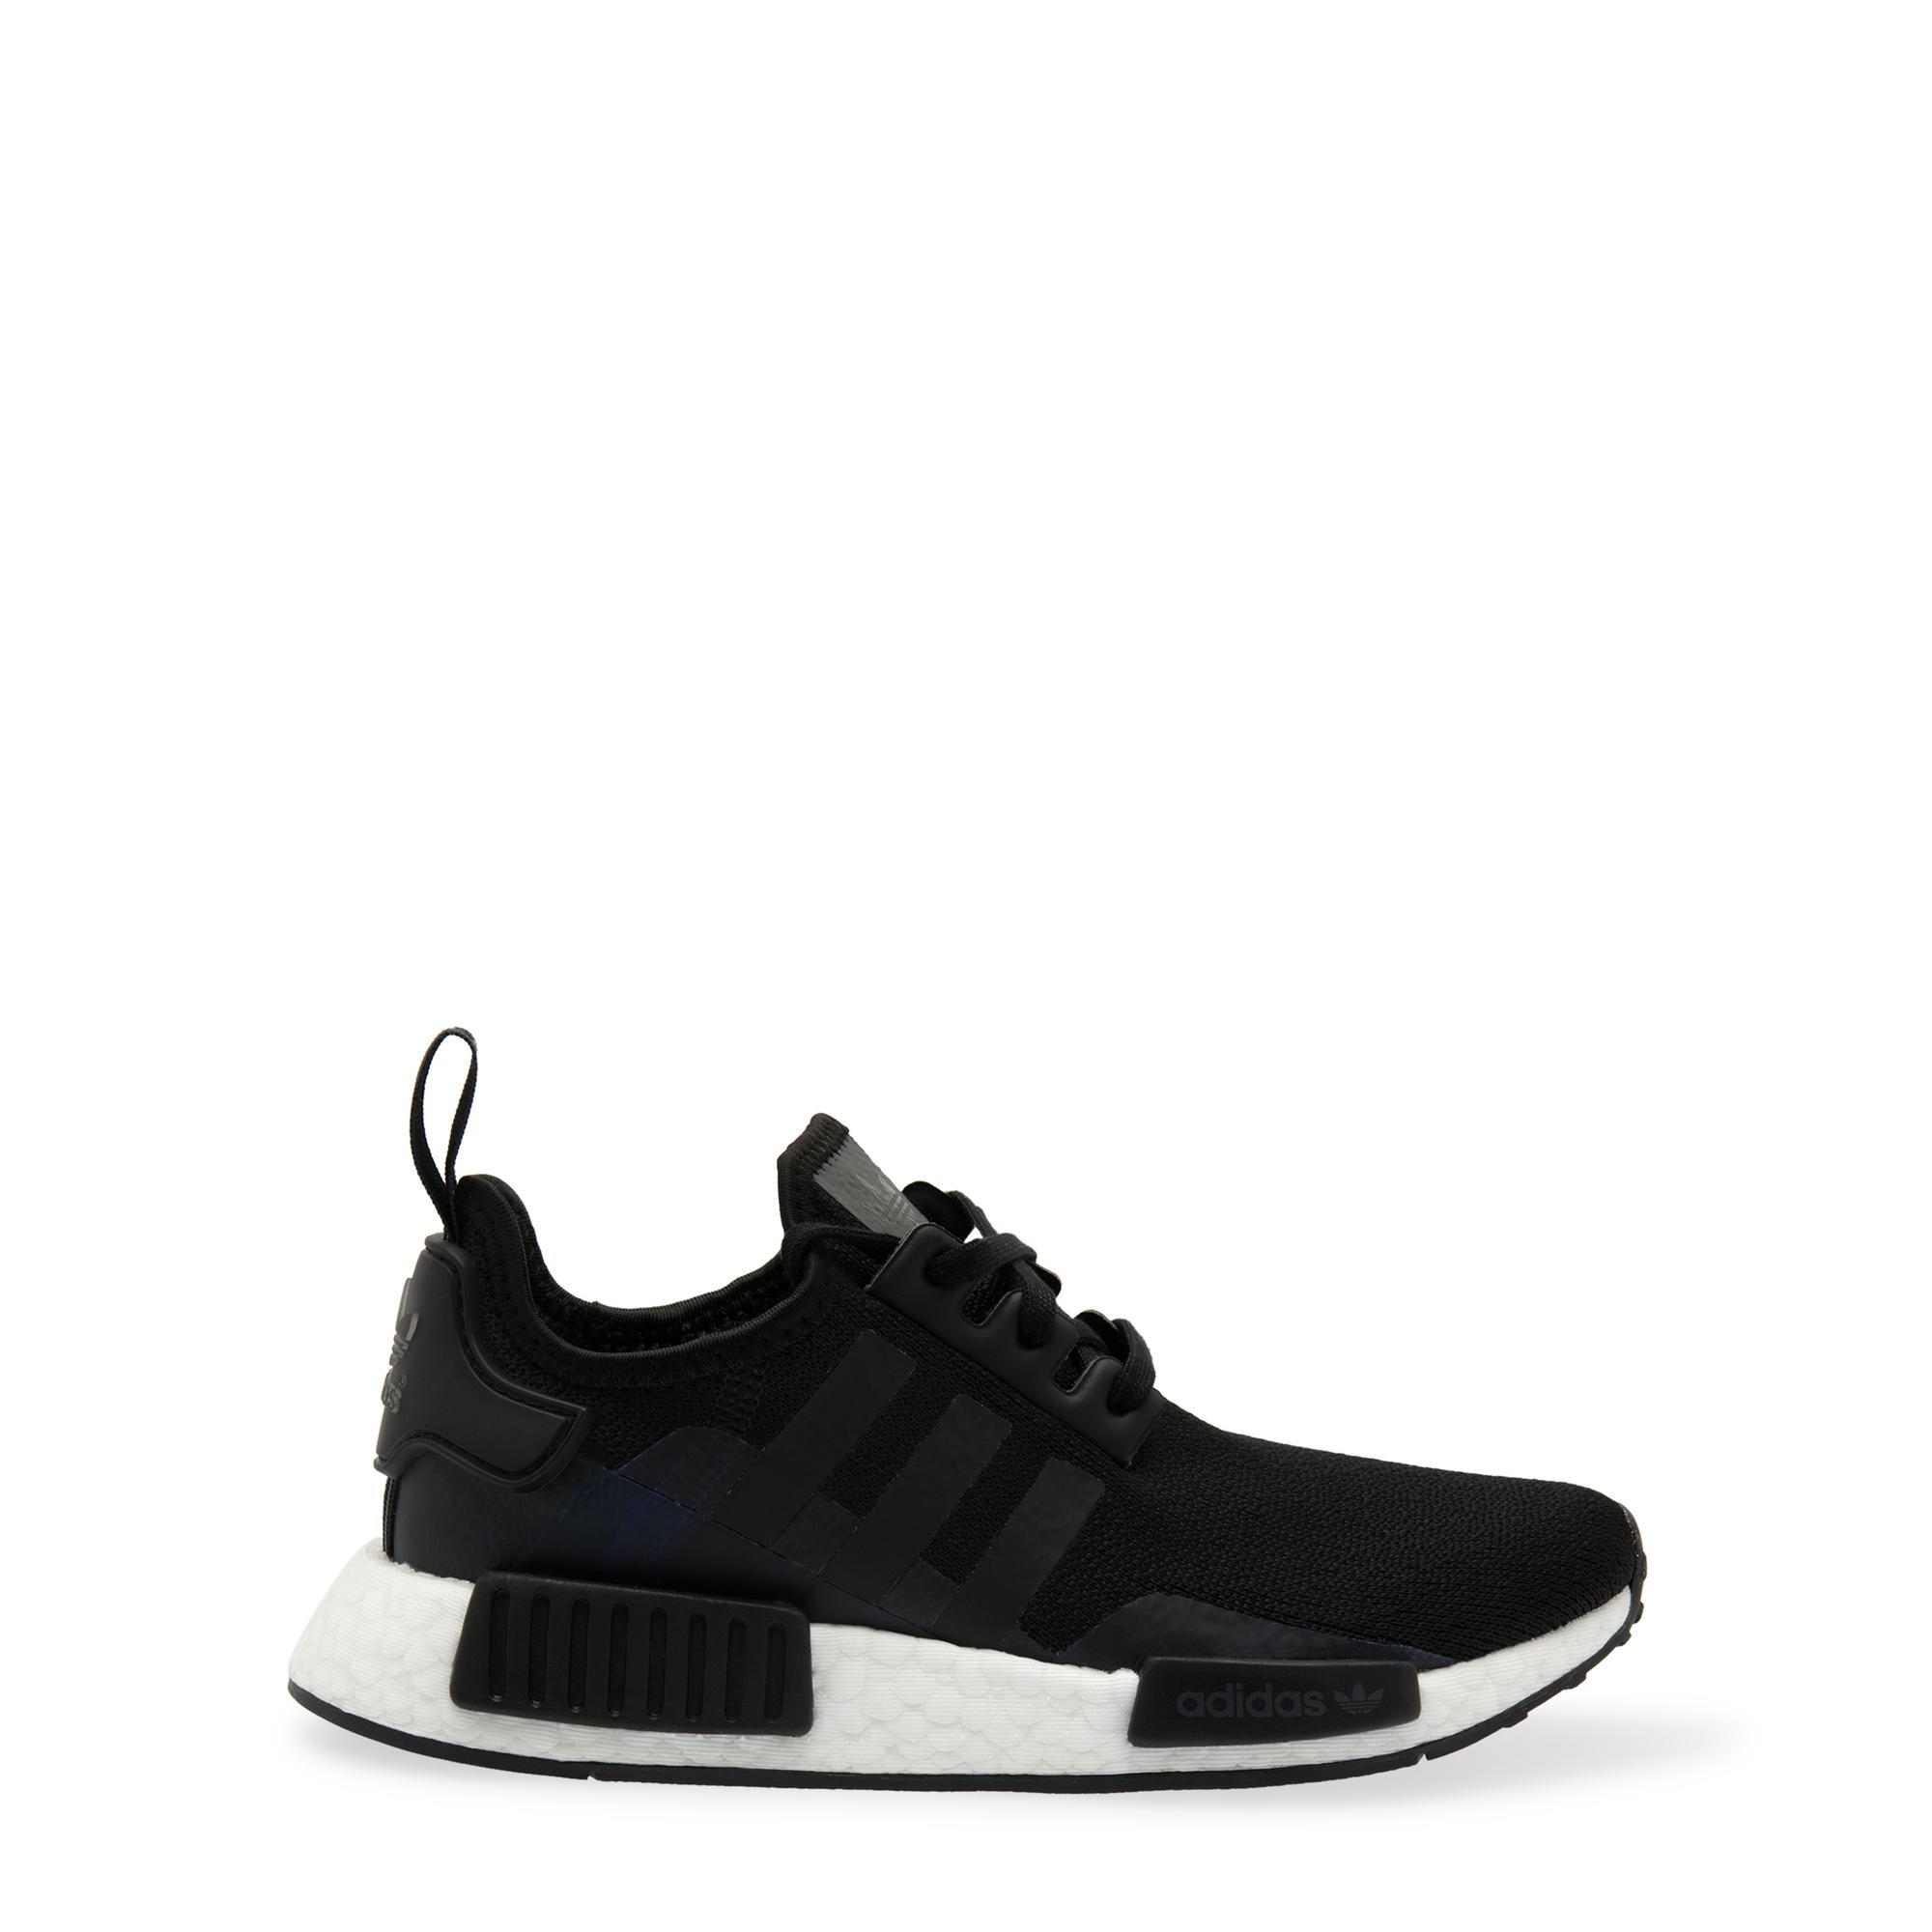 NMD R_1 sneakers